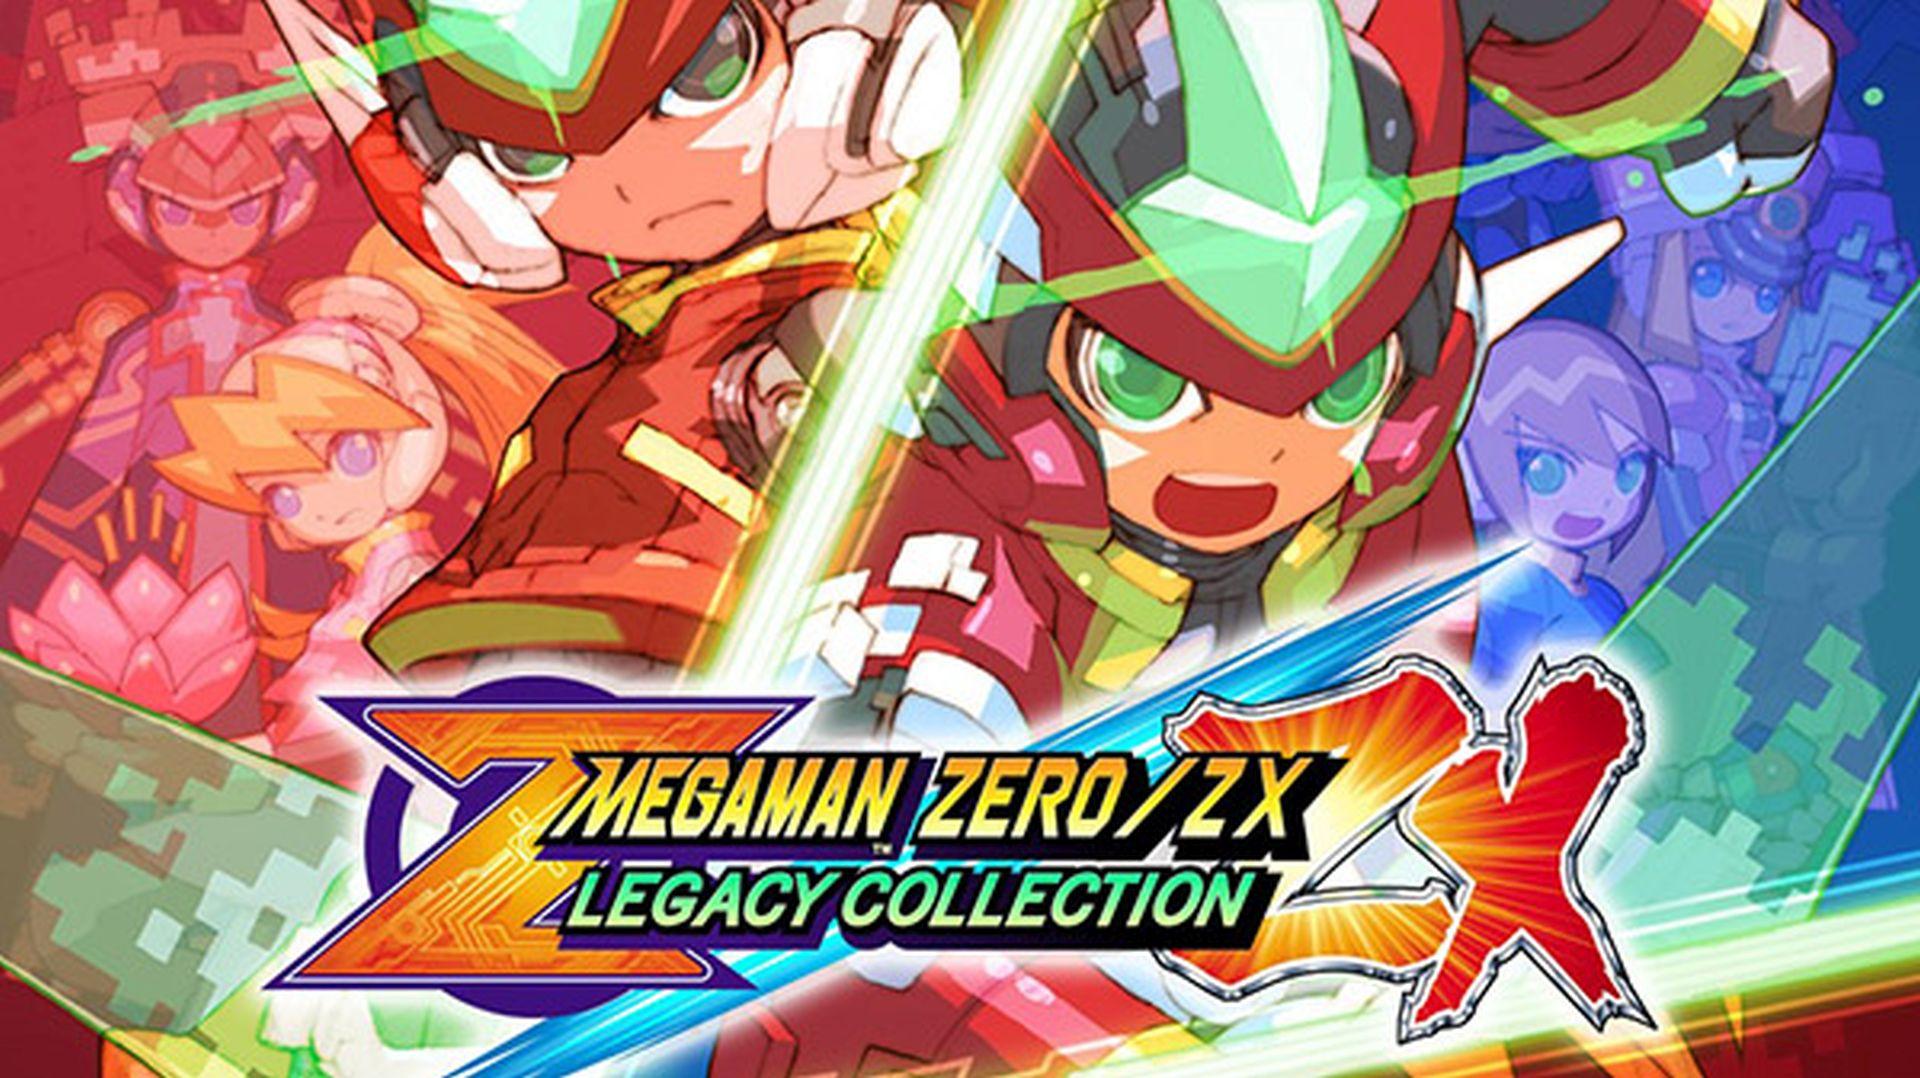 Megaman Zero ZX Legacy Collection